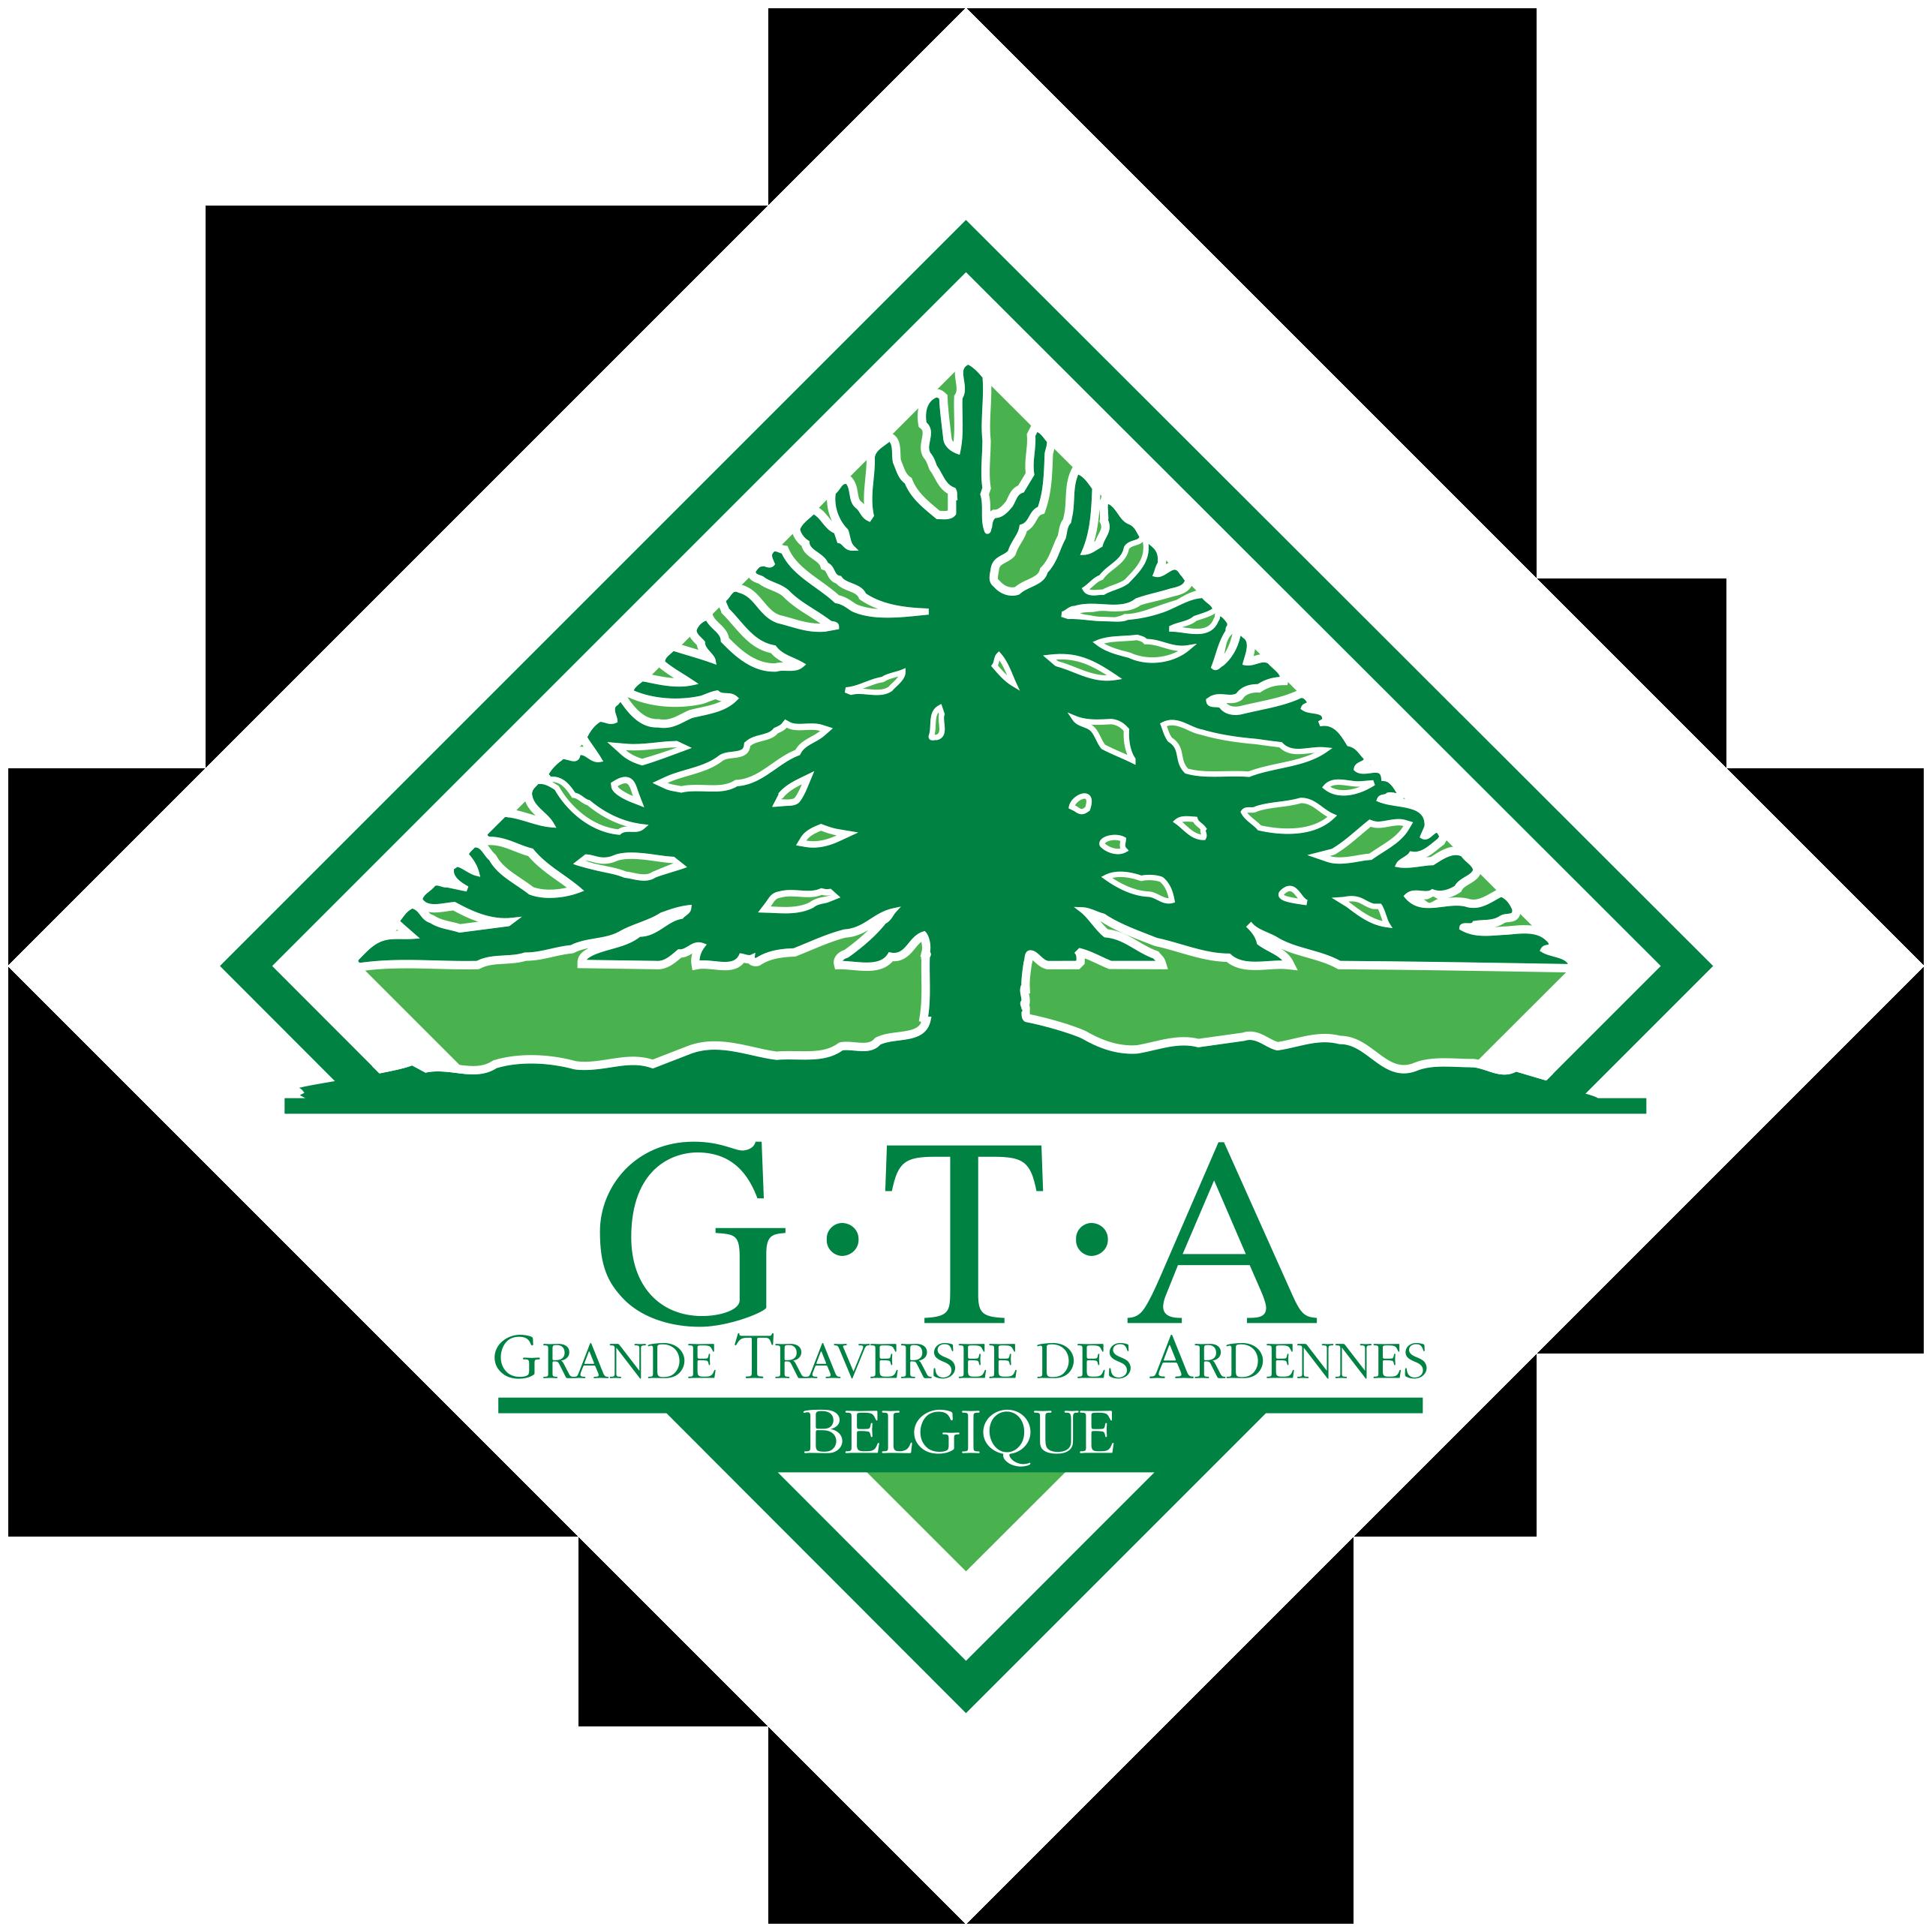 cropped-GTA_Logo_01_GTA_Belgique_2C.png